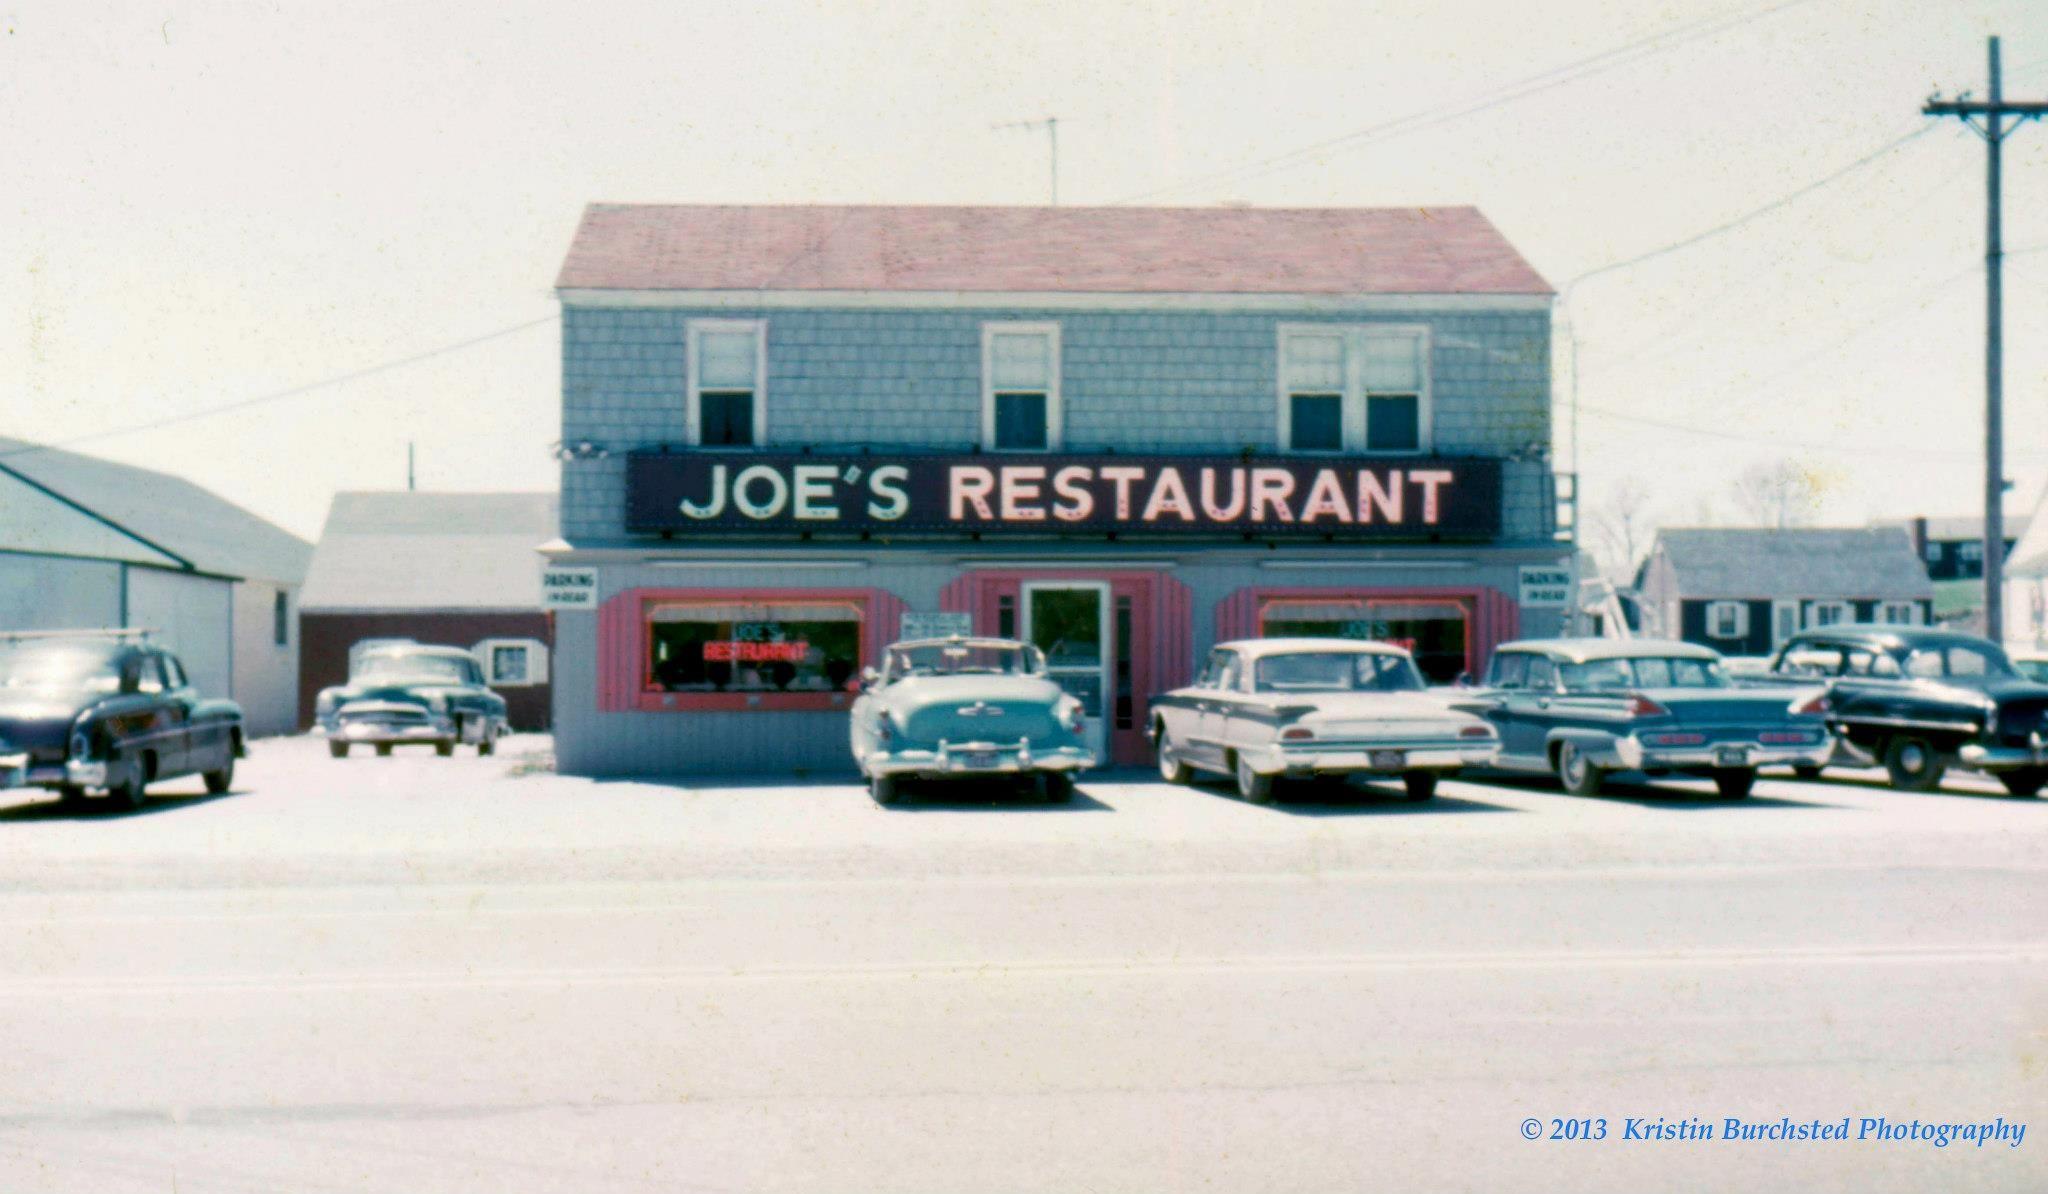 Salem Woodbury School Alumni Joe S Restaurant Rt 28 Ca 1960 Kristin Burchsted Photography Main Street Station New Hampshire Main Street